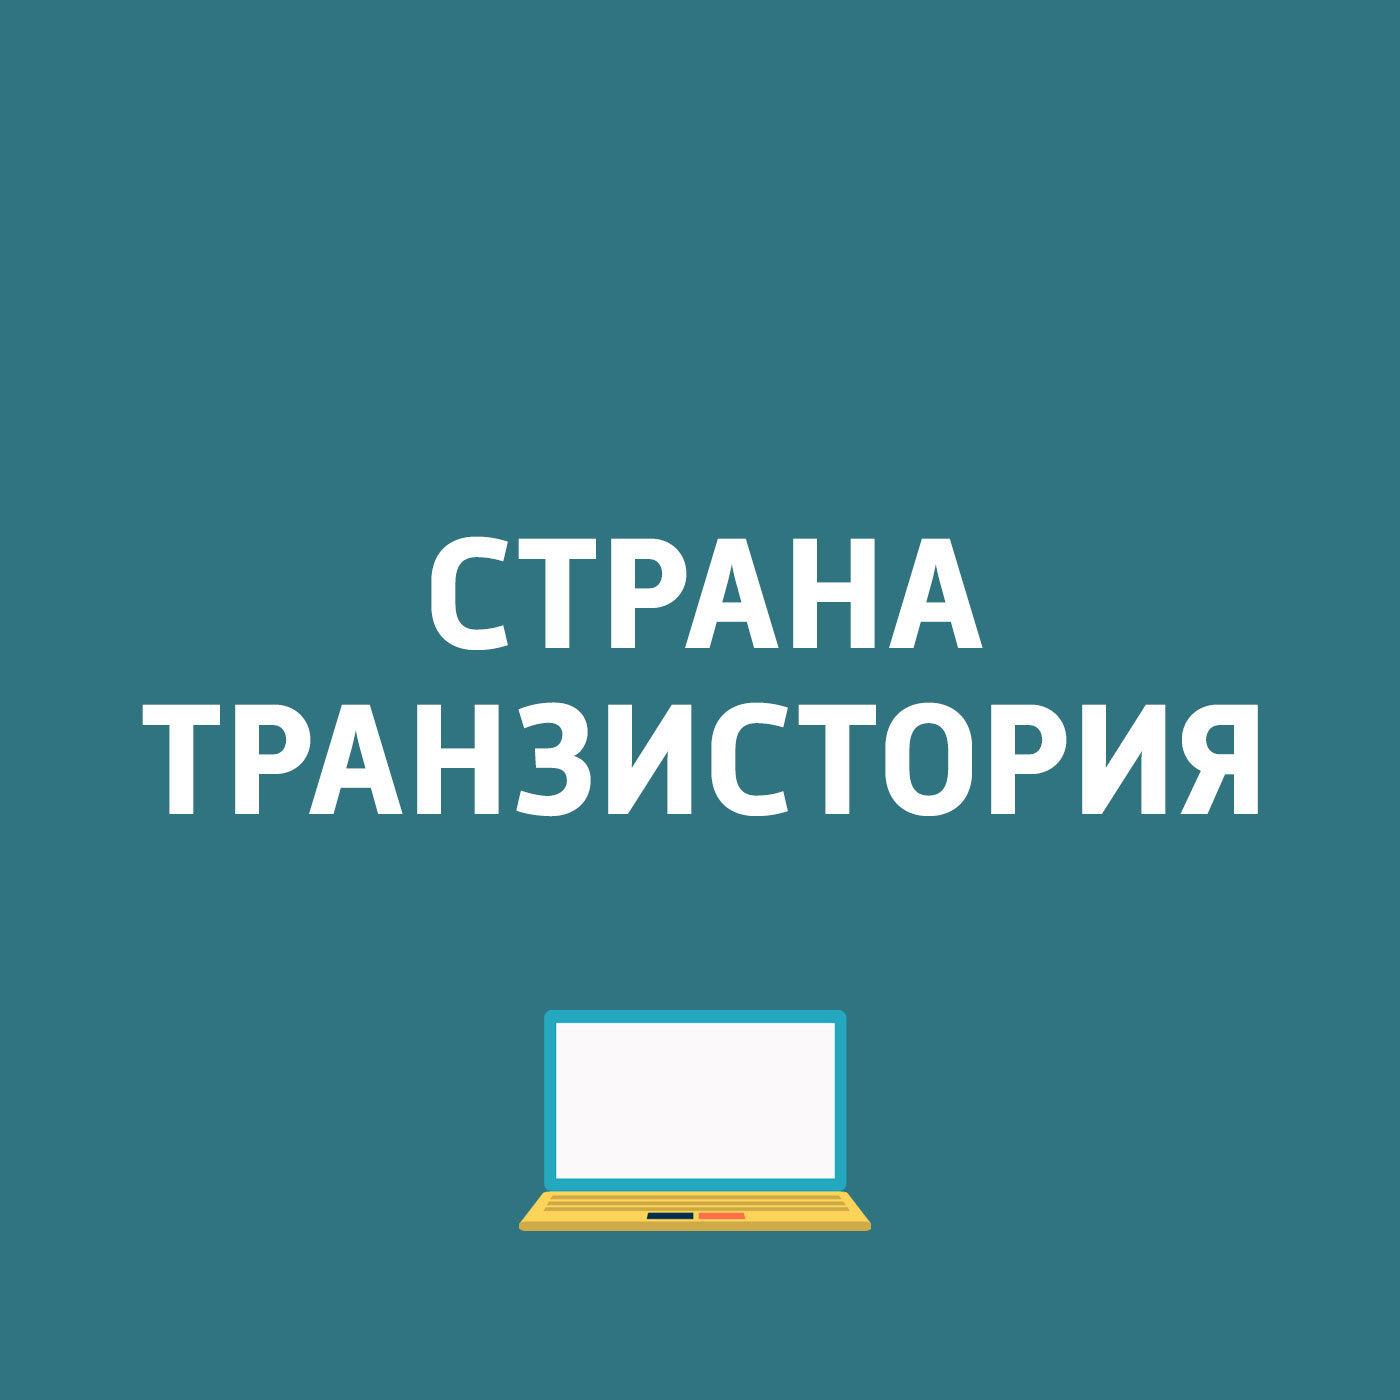 Картаев Павел  РФ  2017 году заработает система Android Pay...